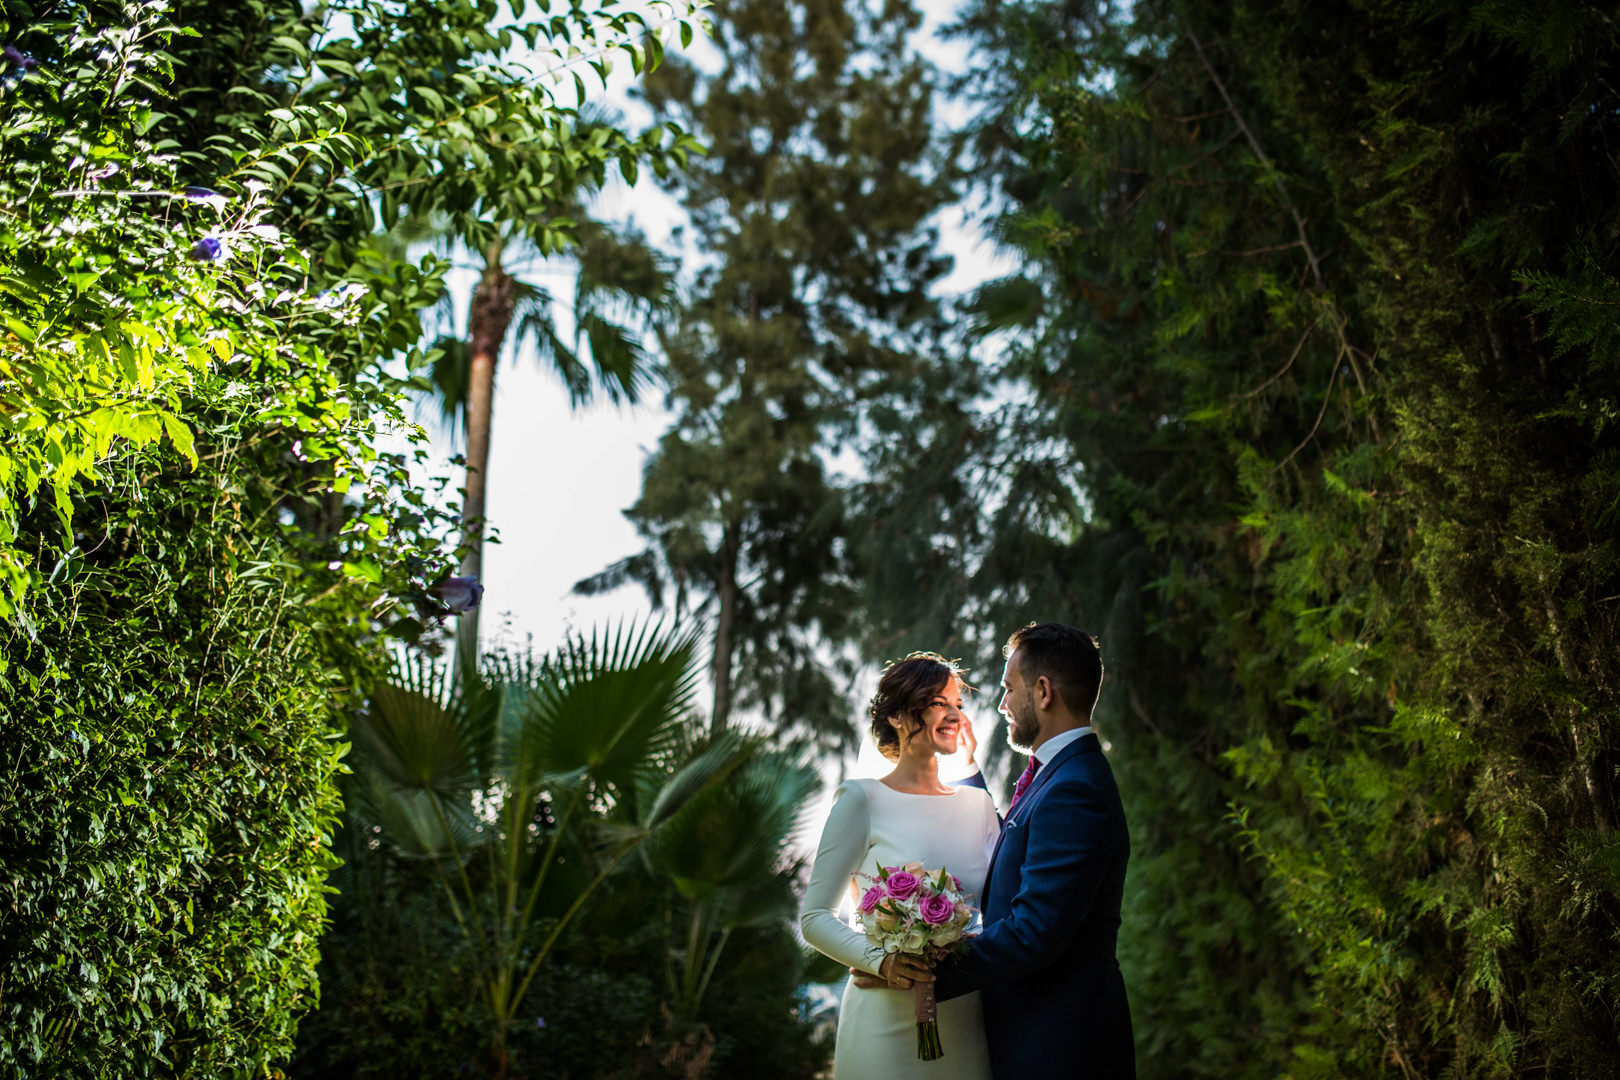 Boda-Irene-Marcos-Dos-Hermanas-Finca-Clotidle-engagement-Rafael-Torres-fotografo-bodas-sevilla-madrid-barcelona-wedding-photographer--30.jpg